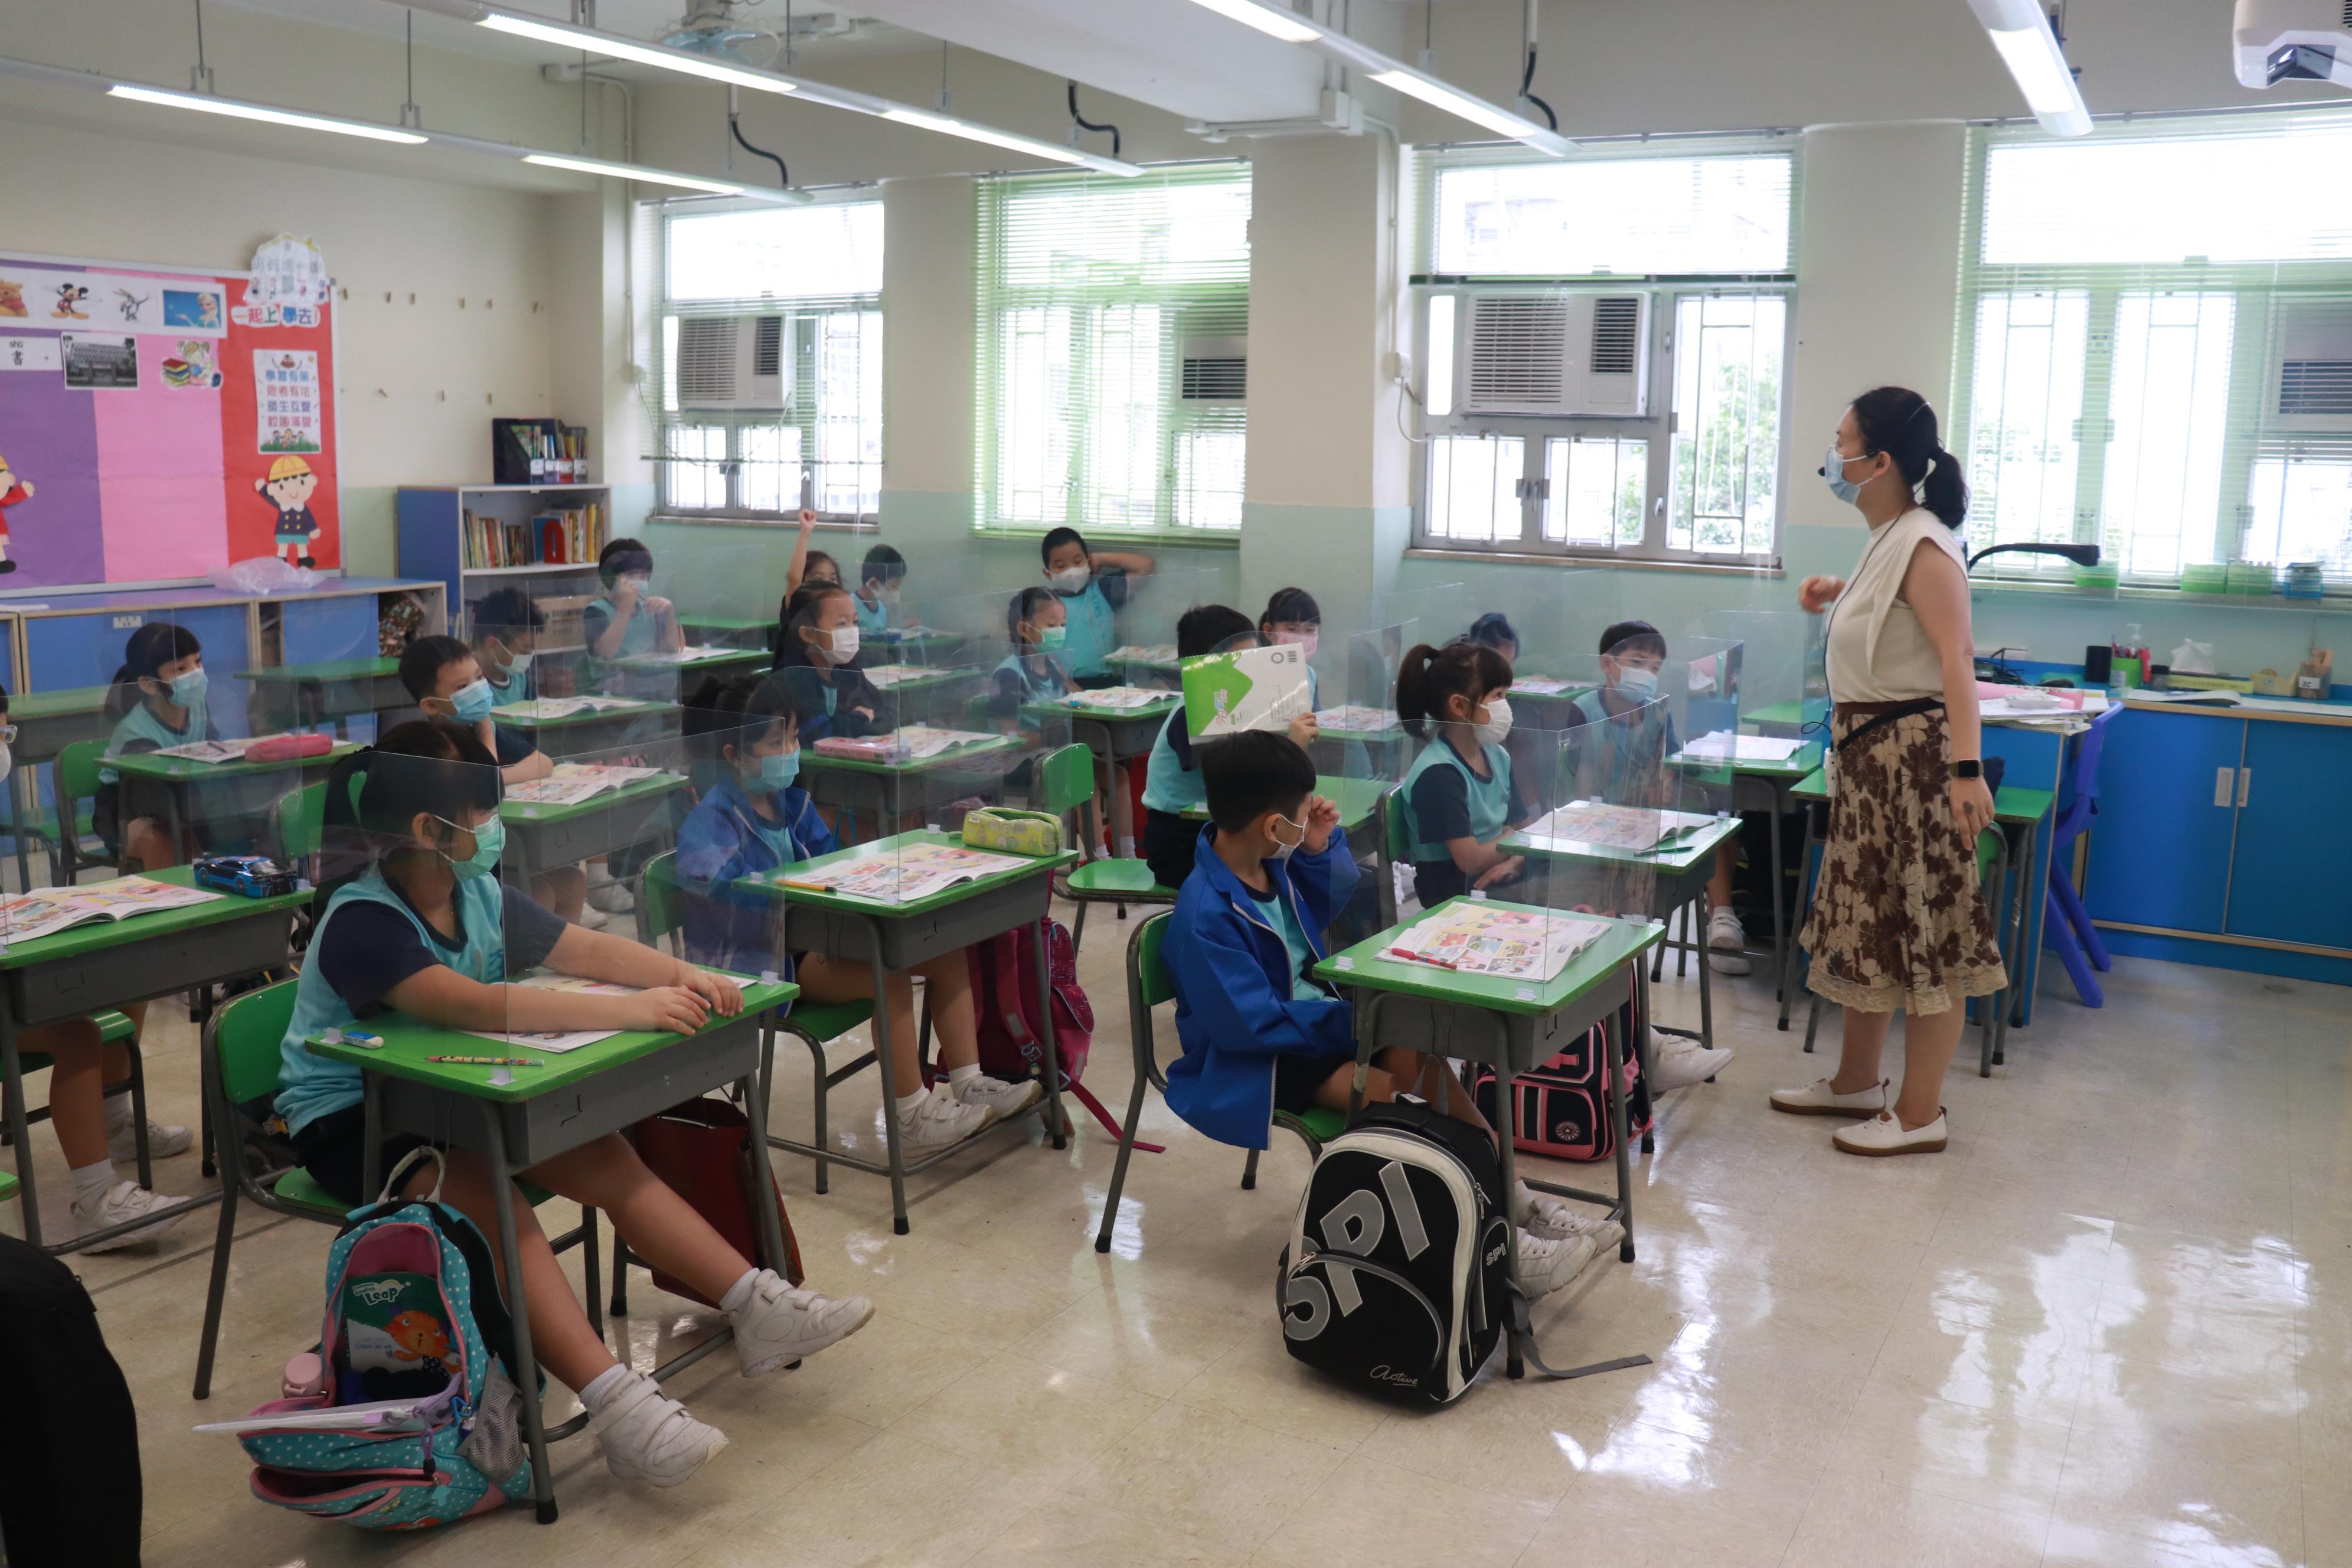 http://keito.school.hk/sites/default/files/img_6217.jpg